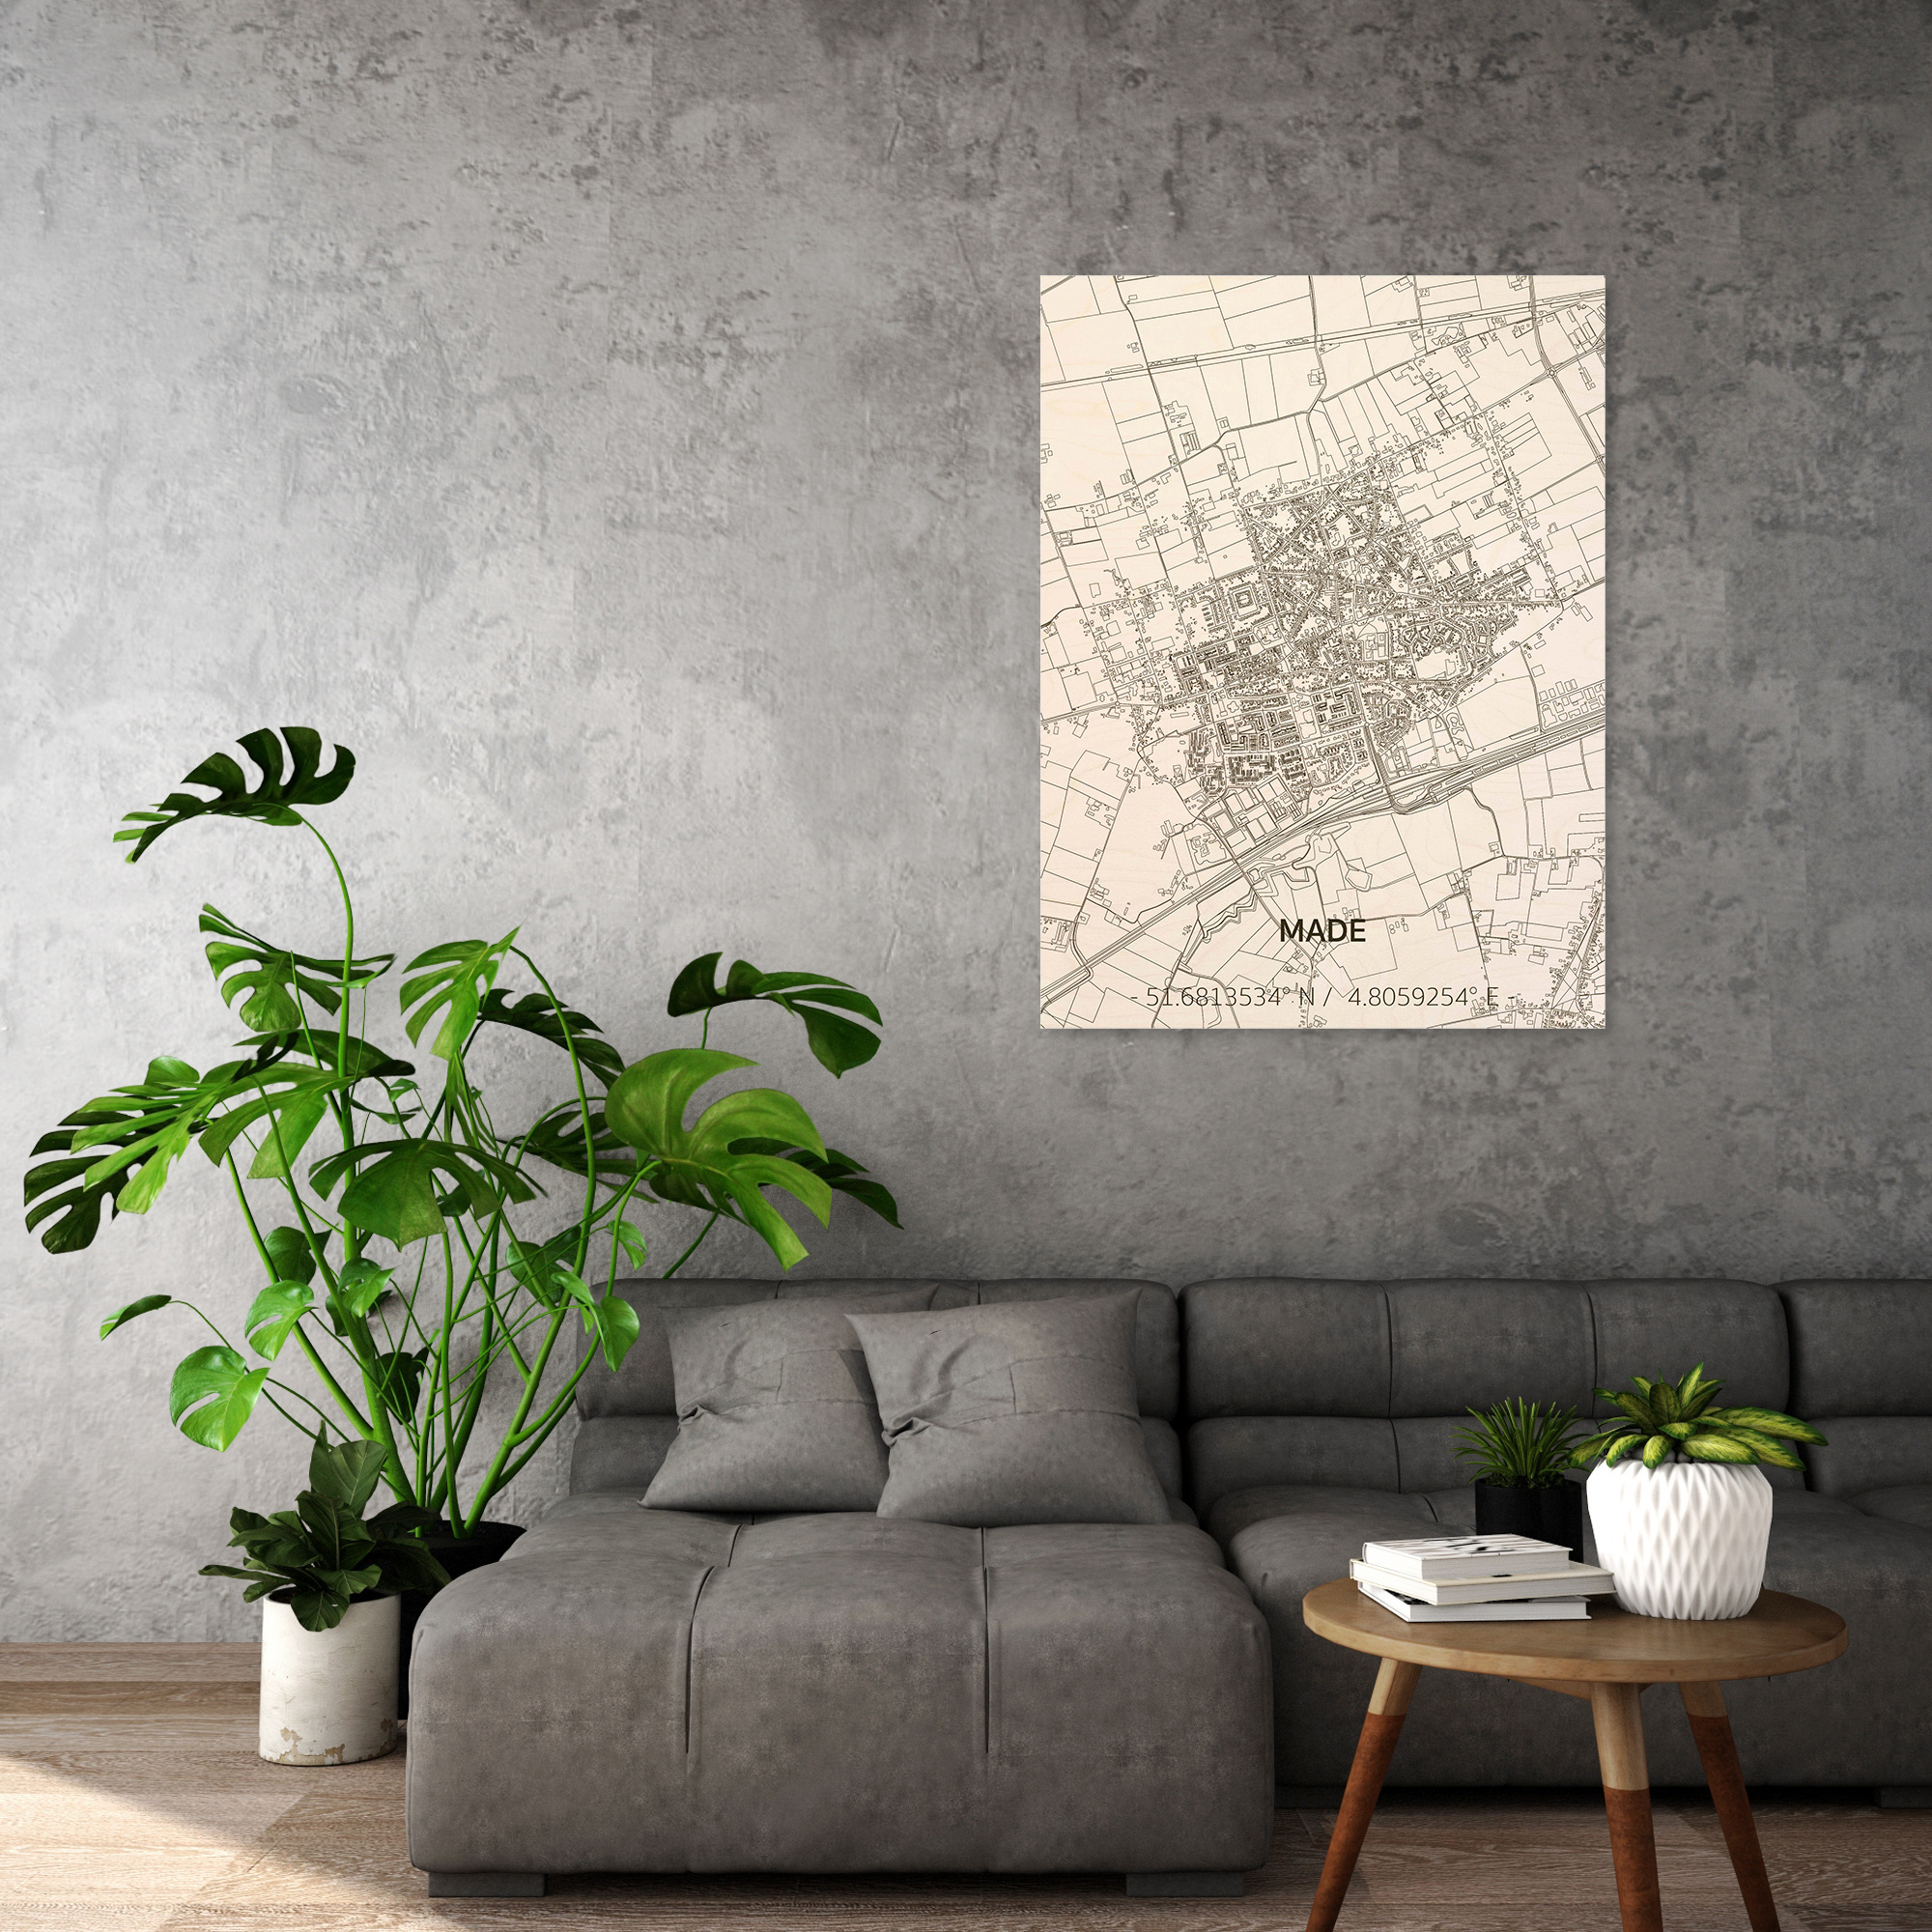 Citymap Made | wooden wall decoration-2